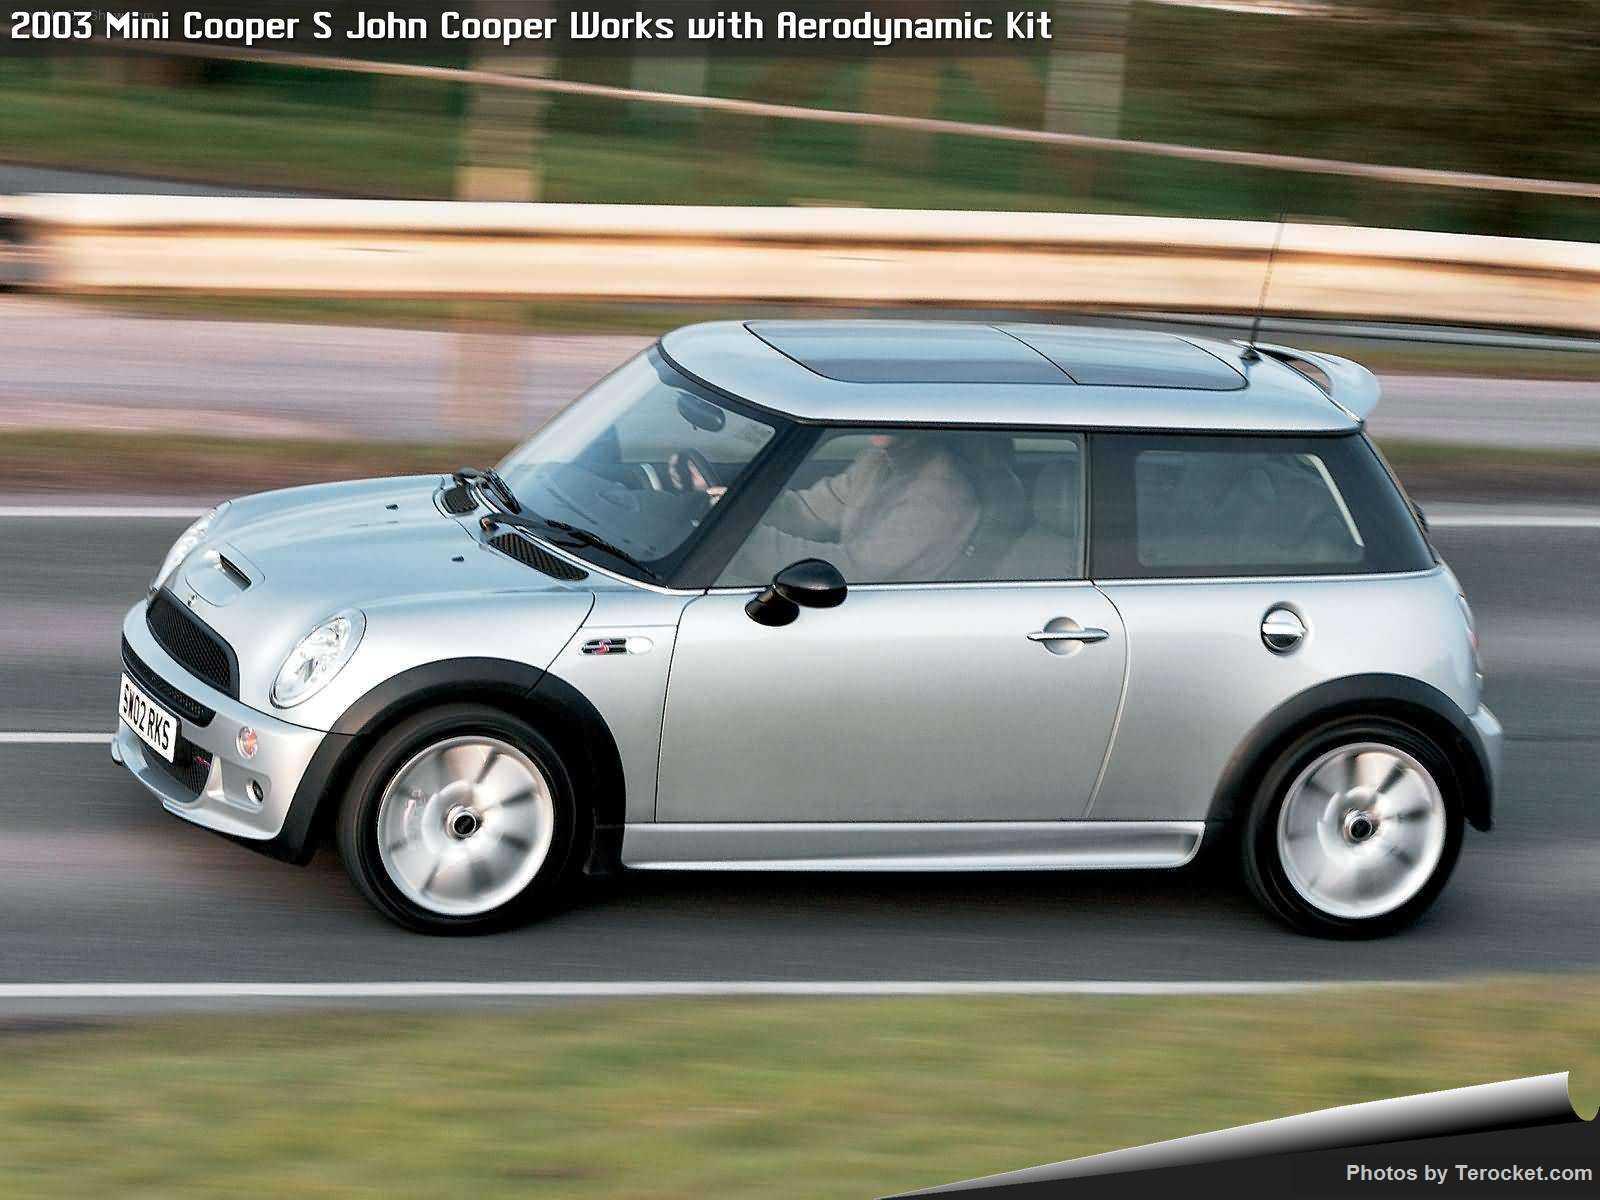 Hình ảnh xe ô tô Mini Cooper S John Cooper Works with Aerodynamic Kit 2003 & nội ngoại thất